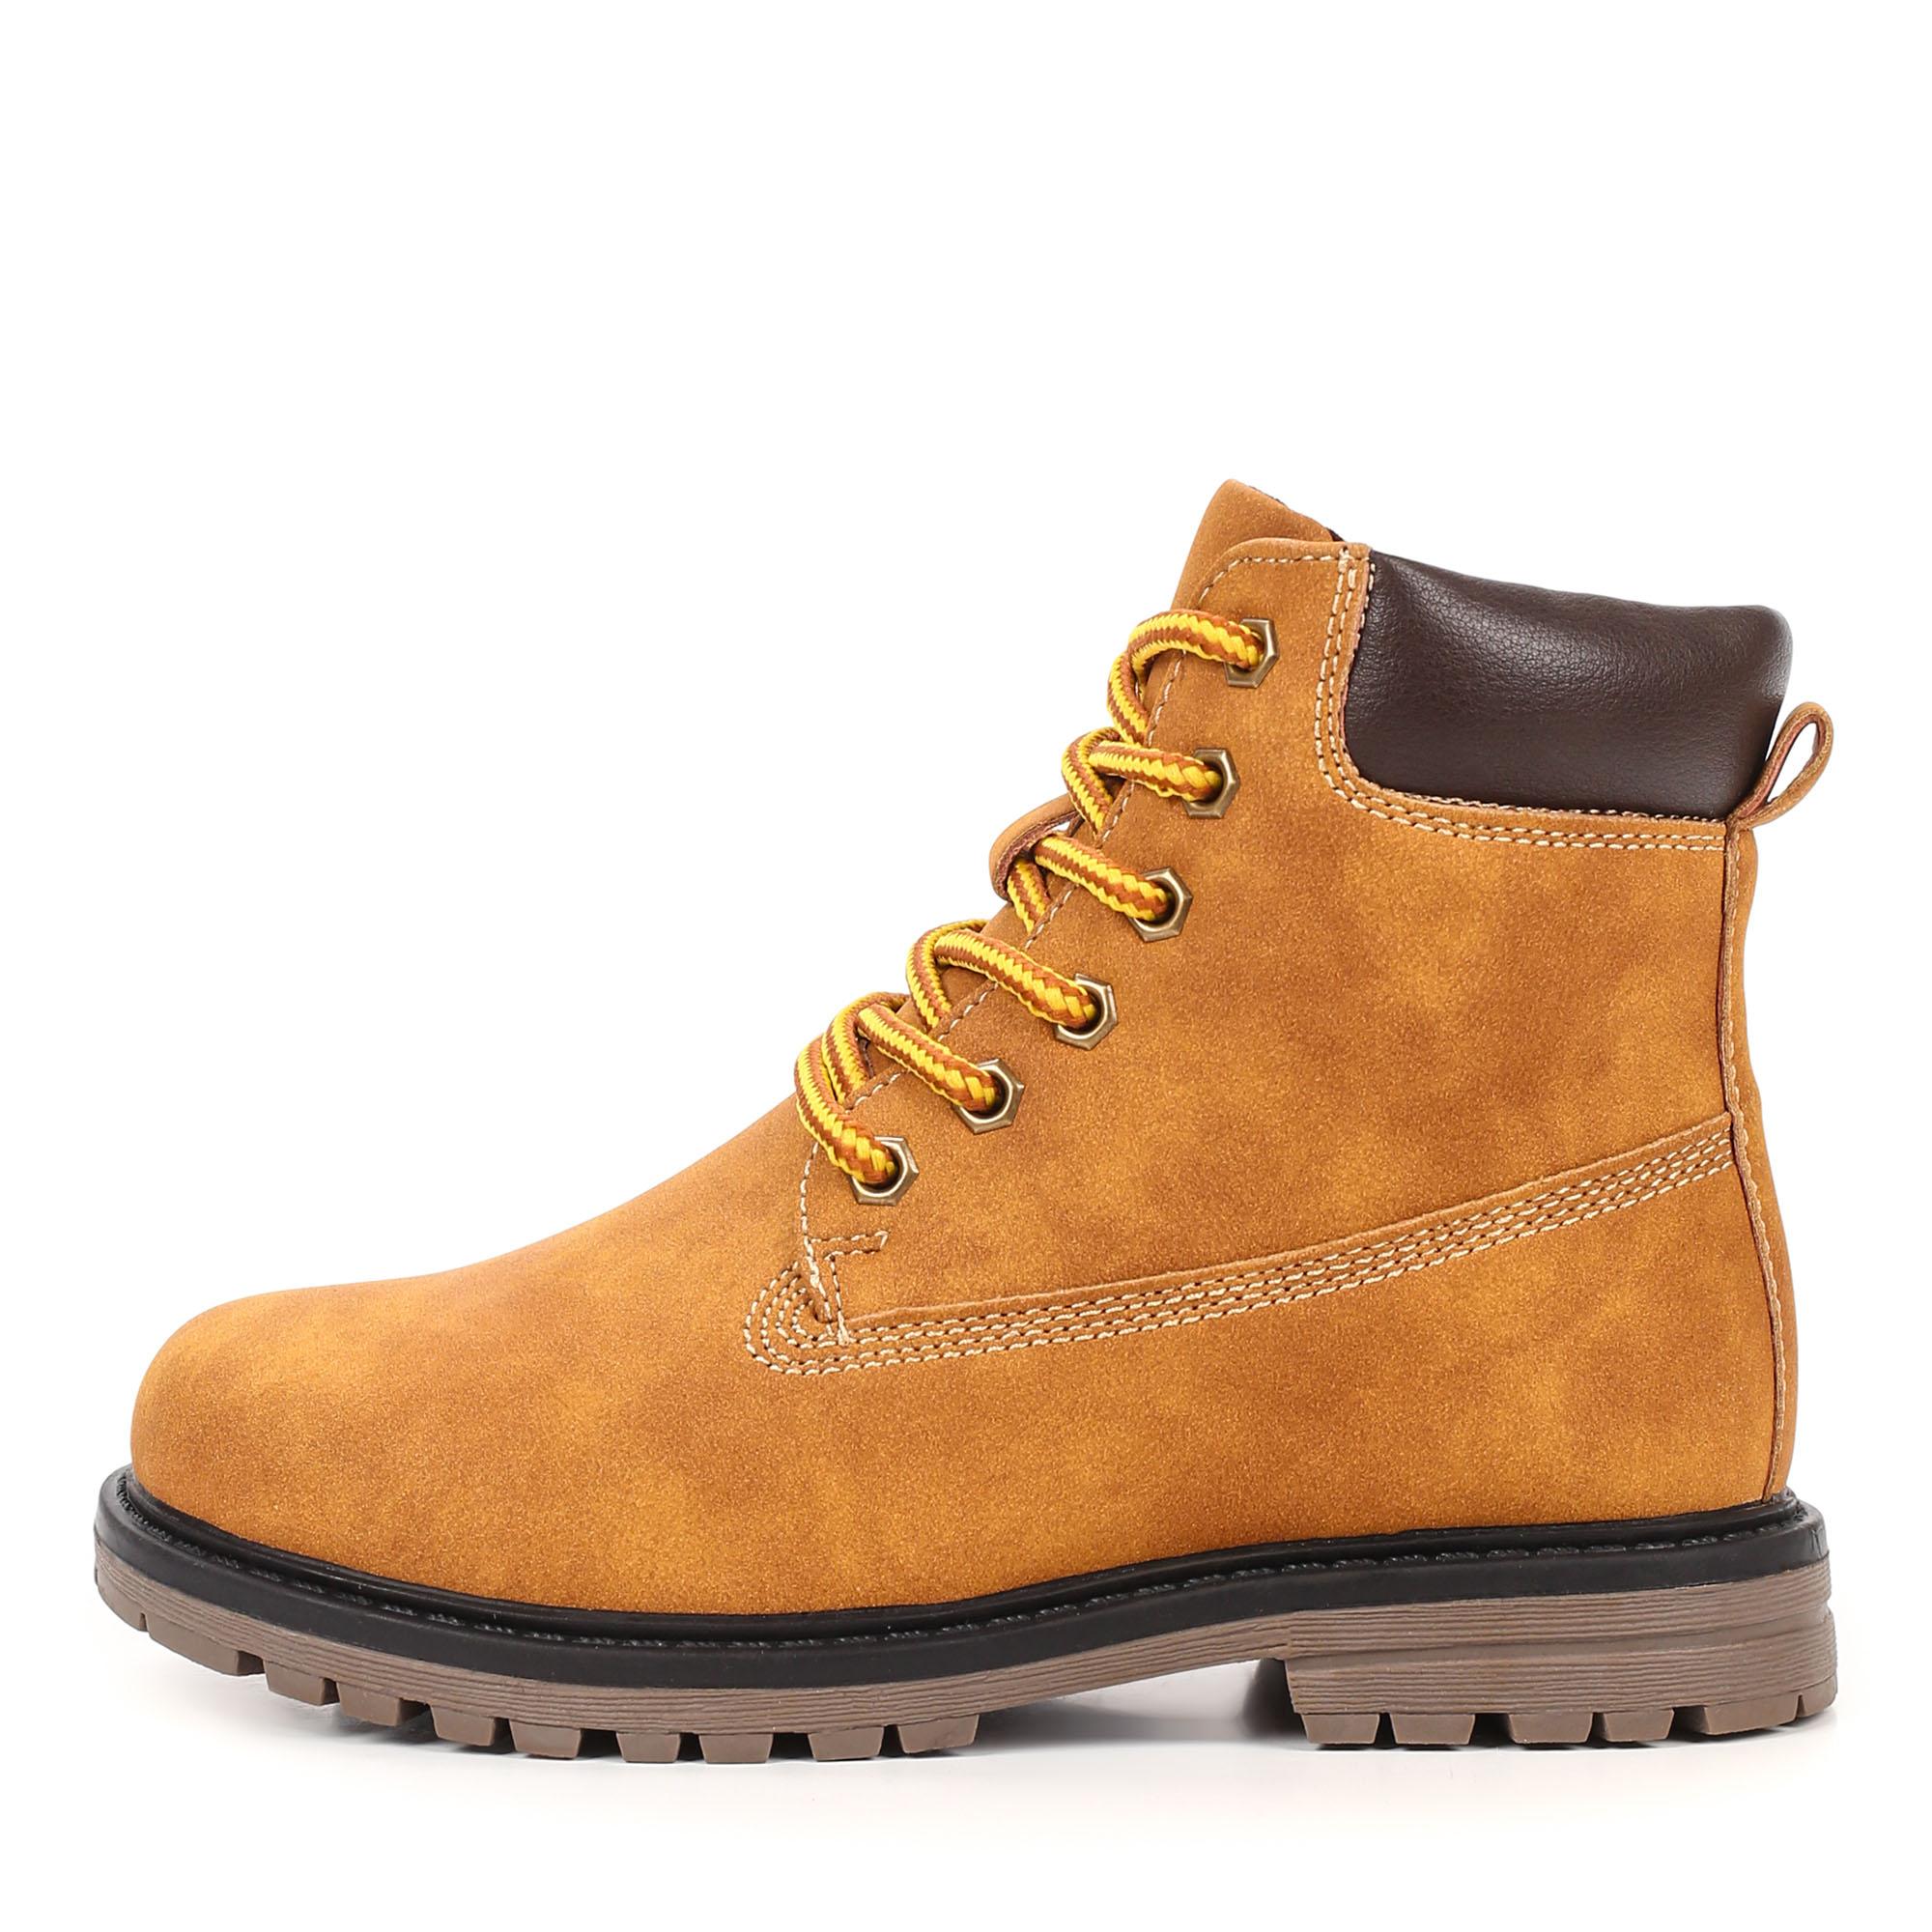 Обувь для мальчиков ZENDEN first 98-02BO-005SN